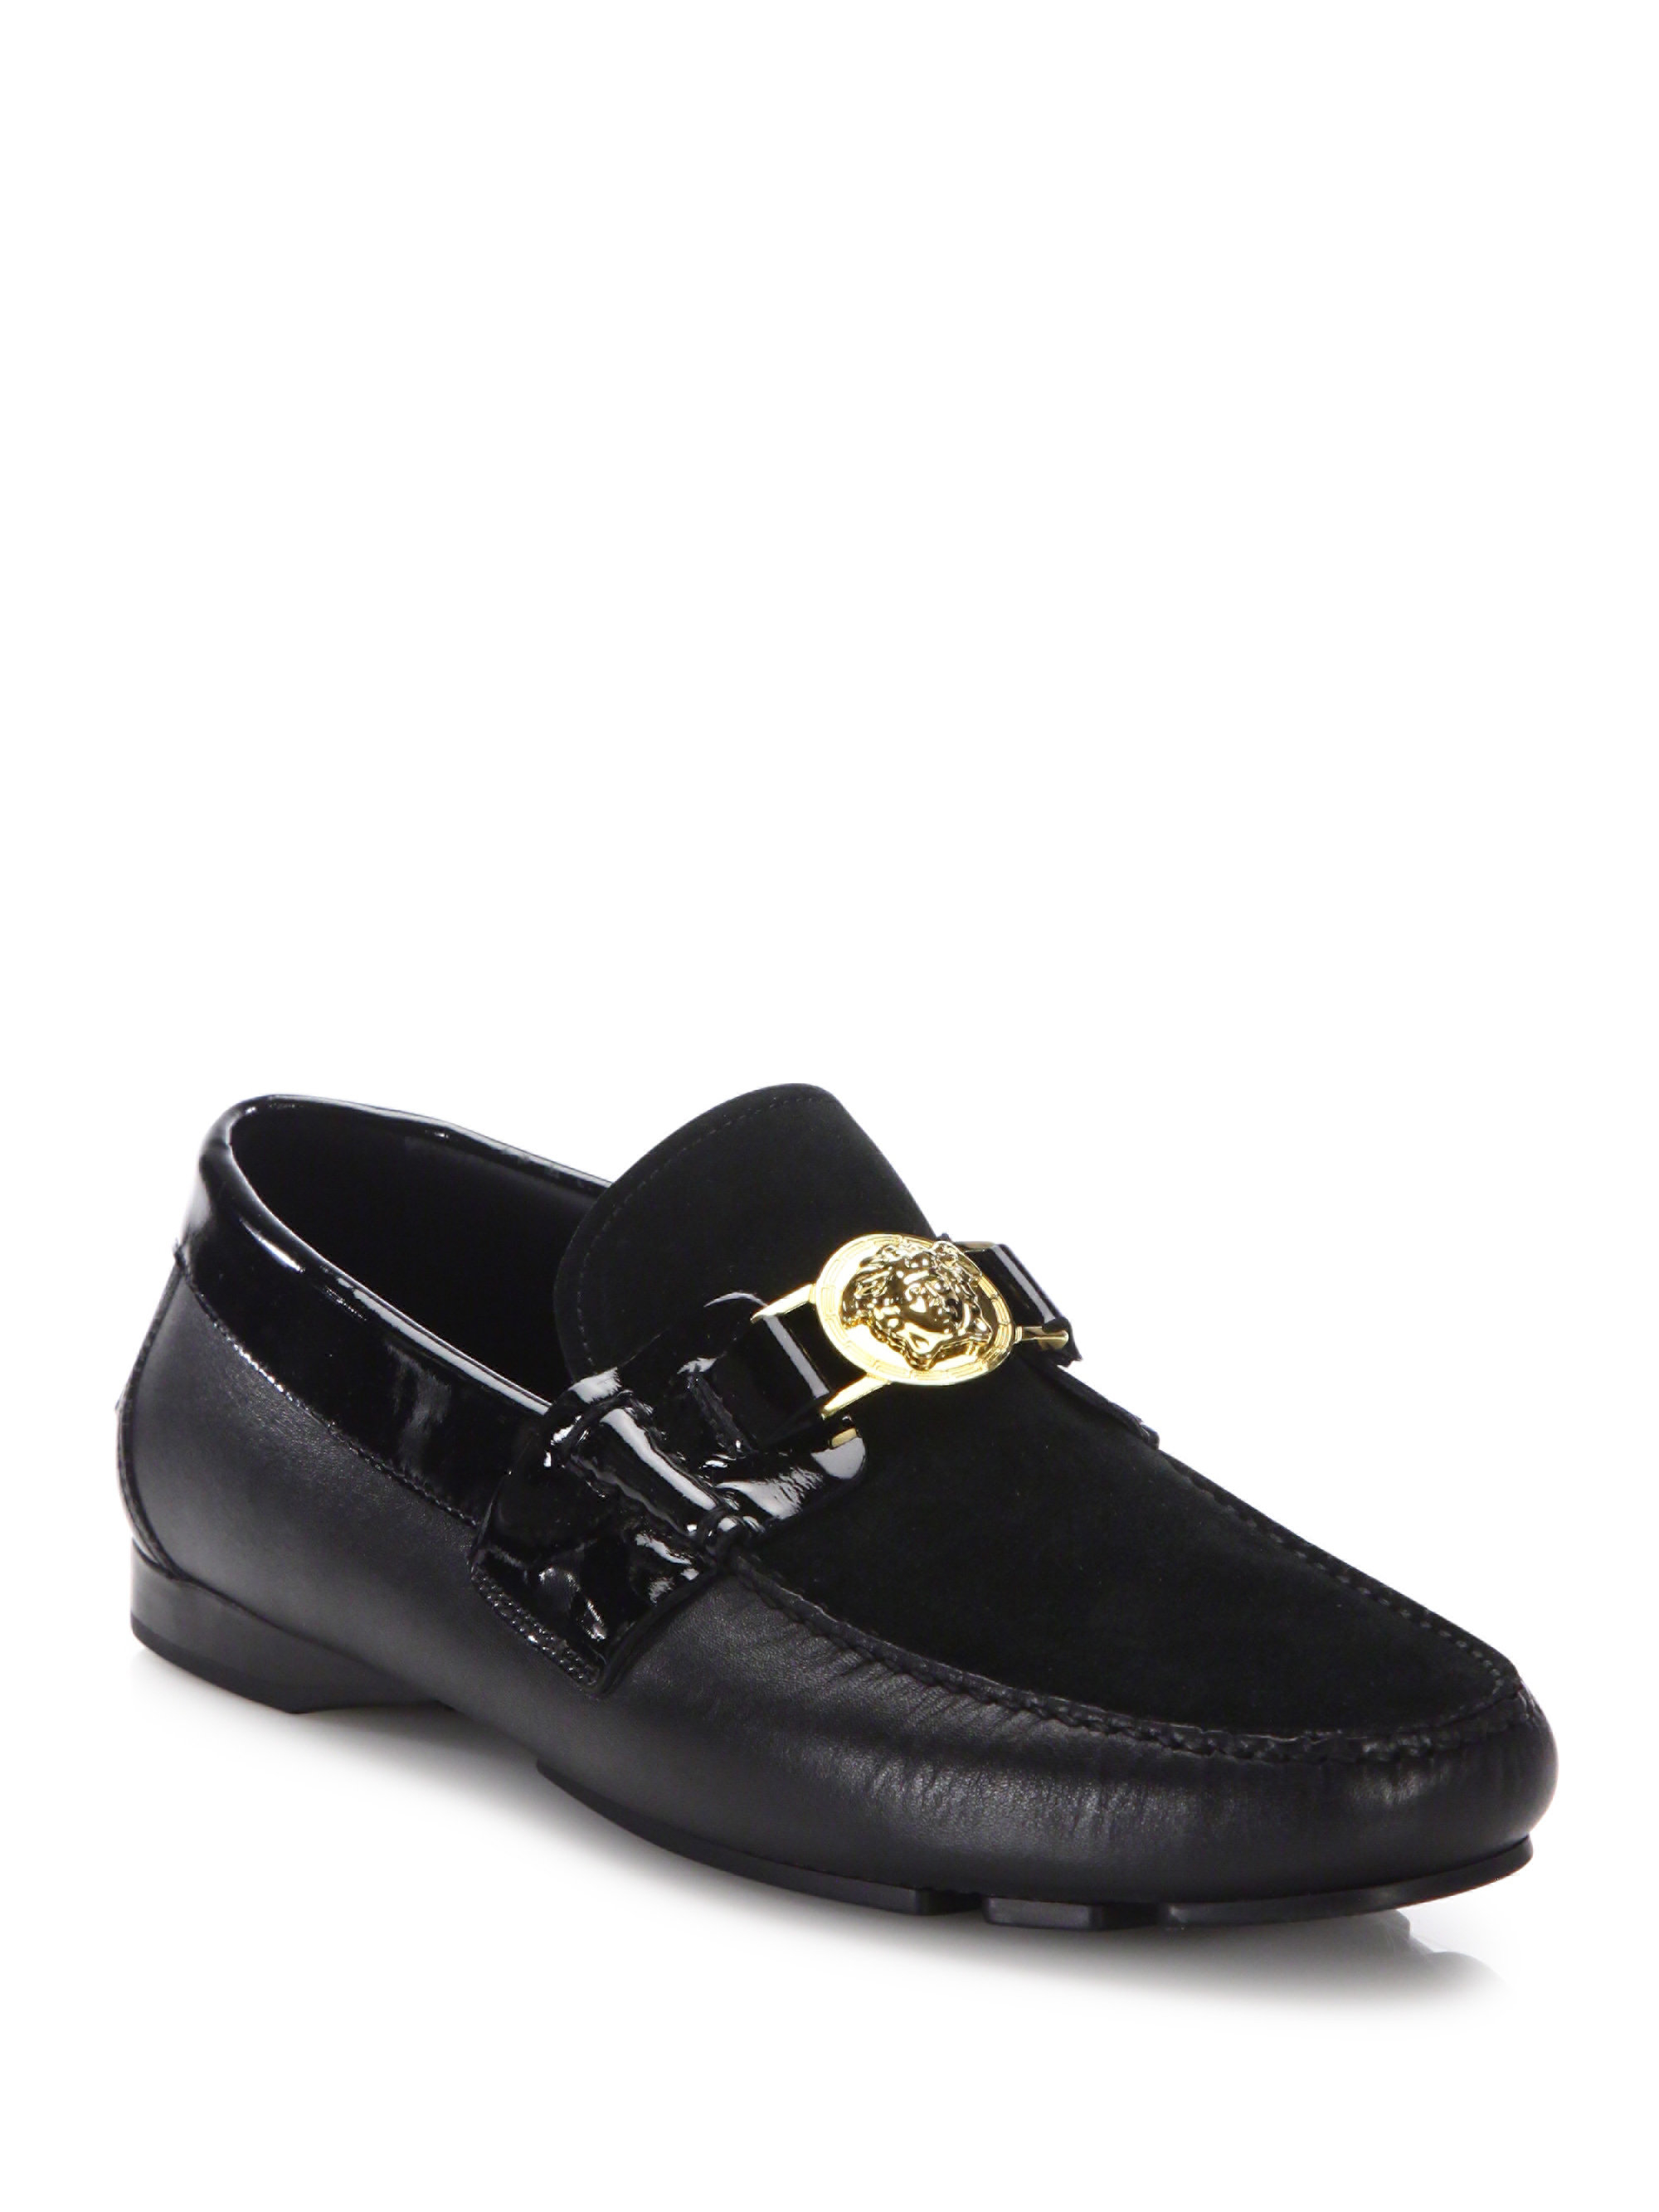 Versace Shoes For Men